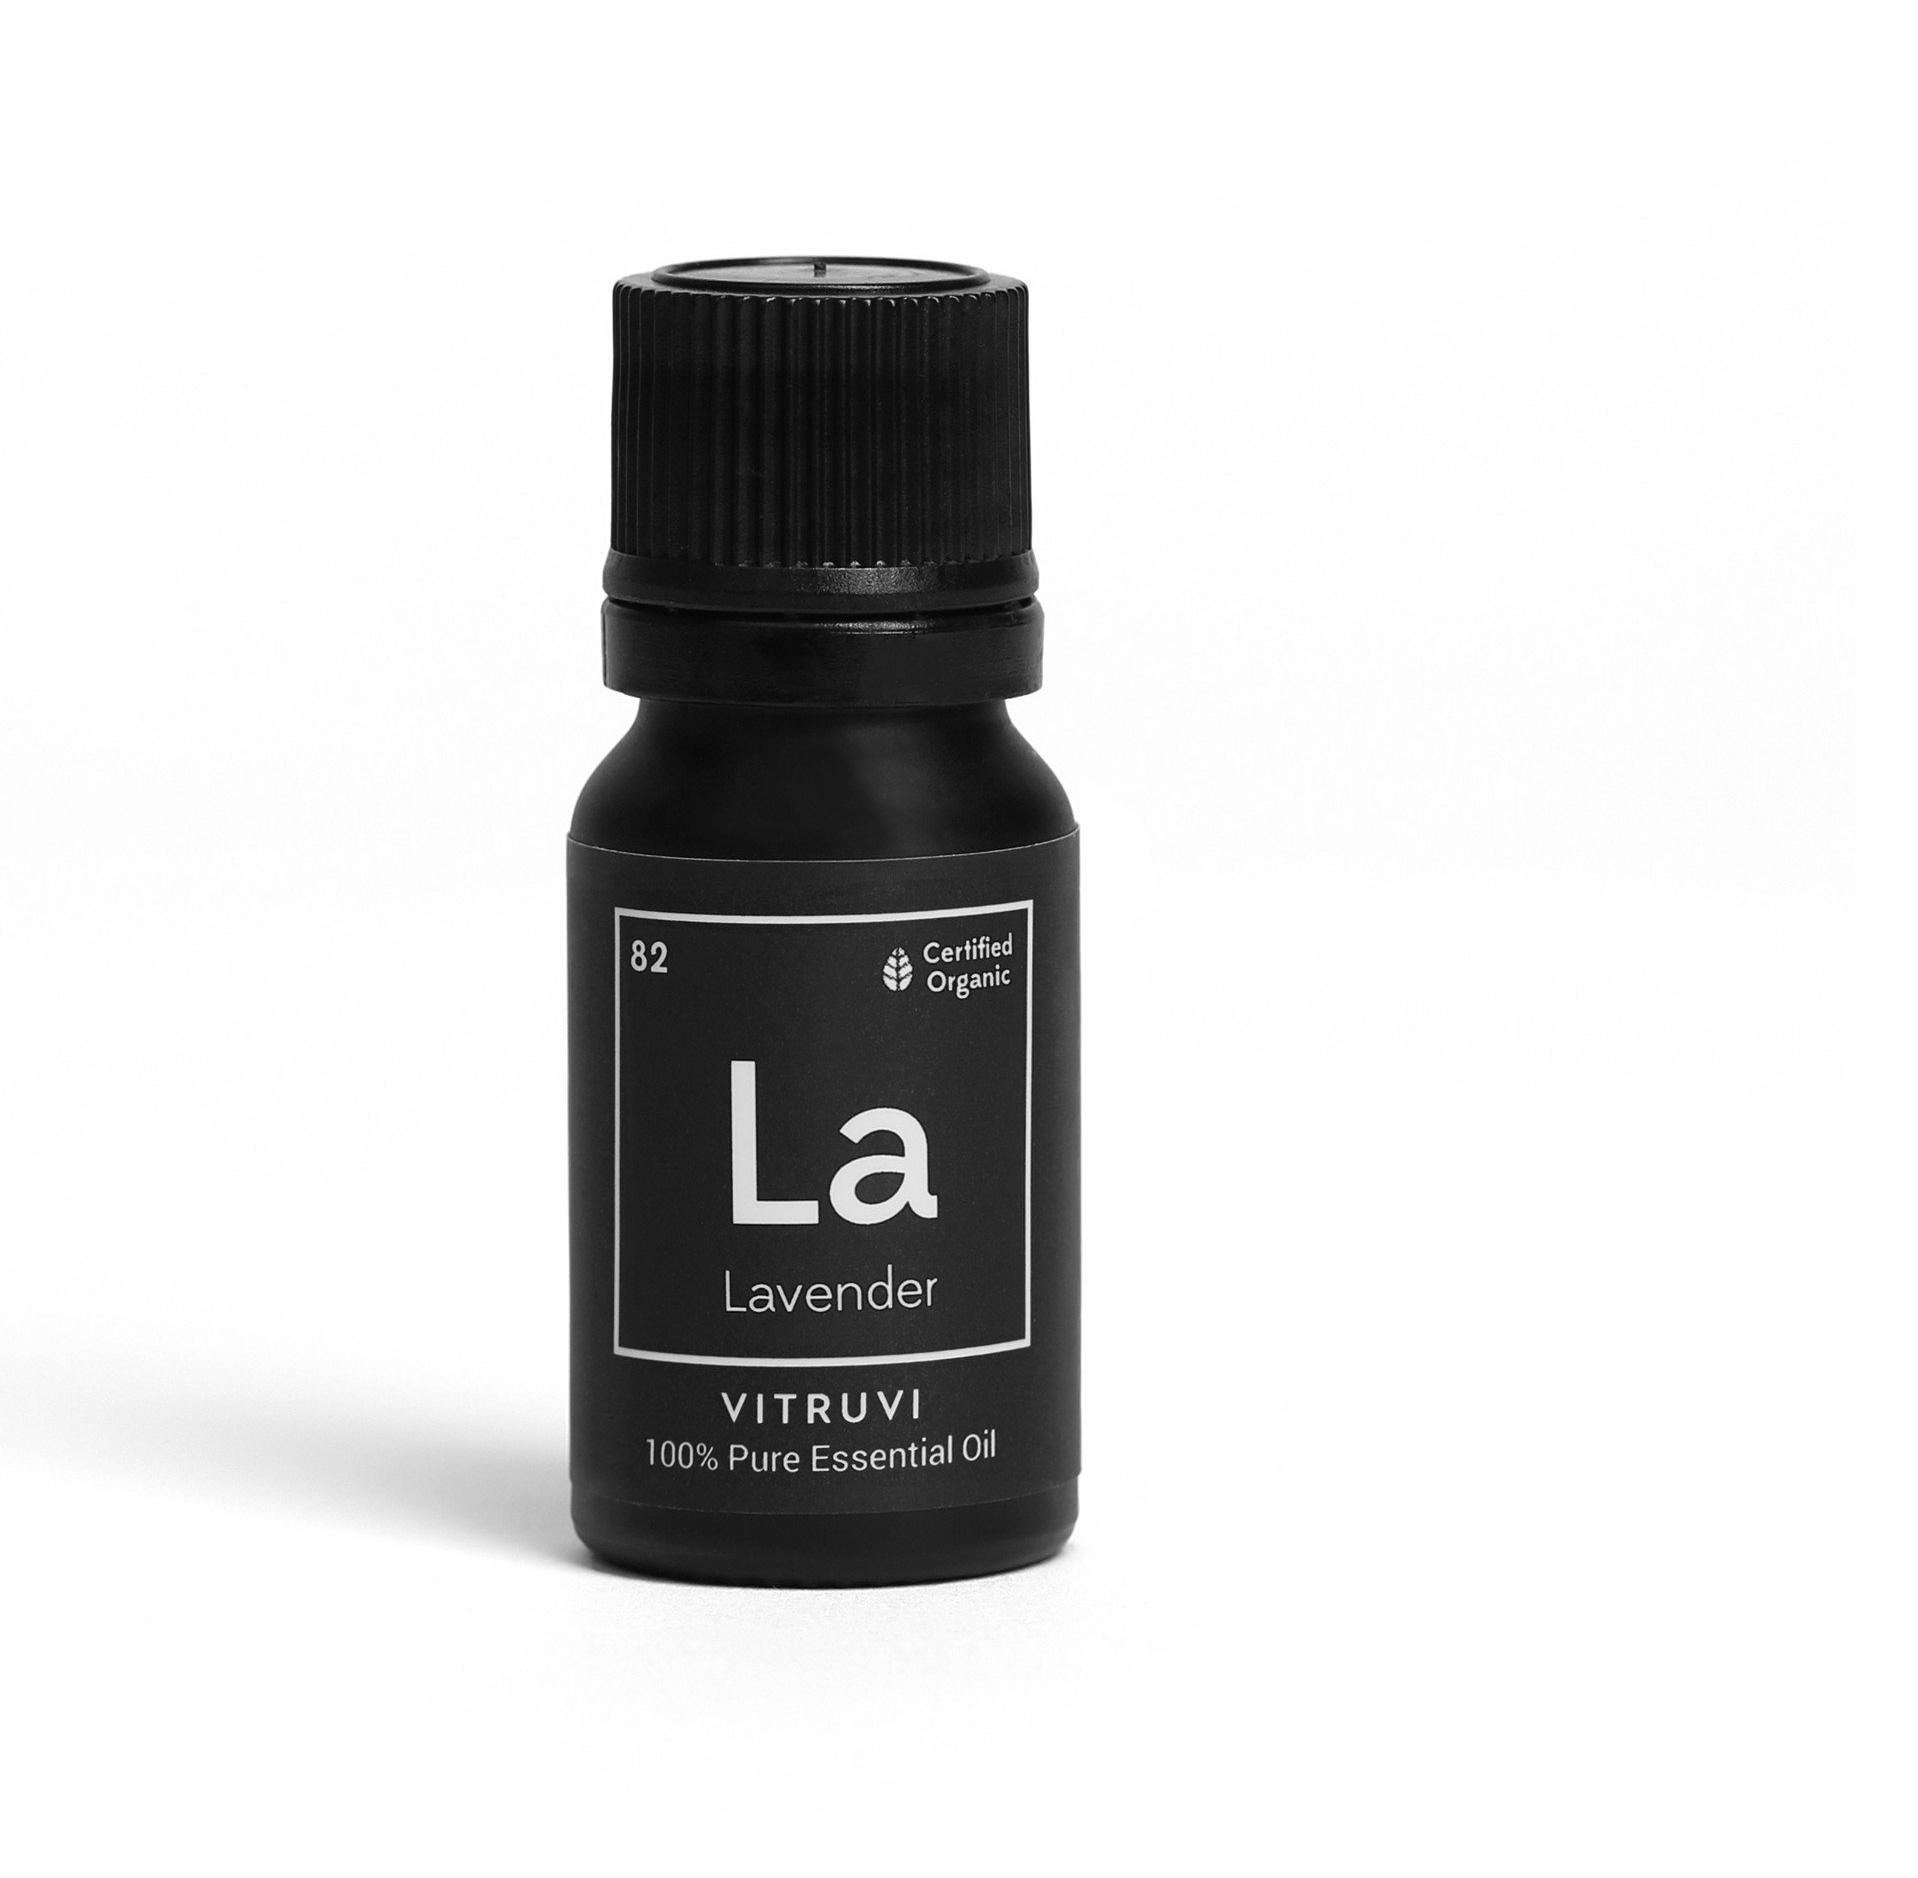 Vitruvi Lavender Essential Oil